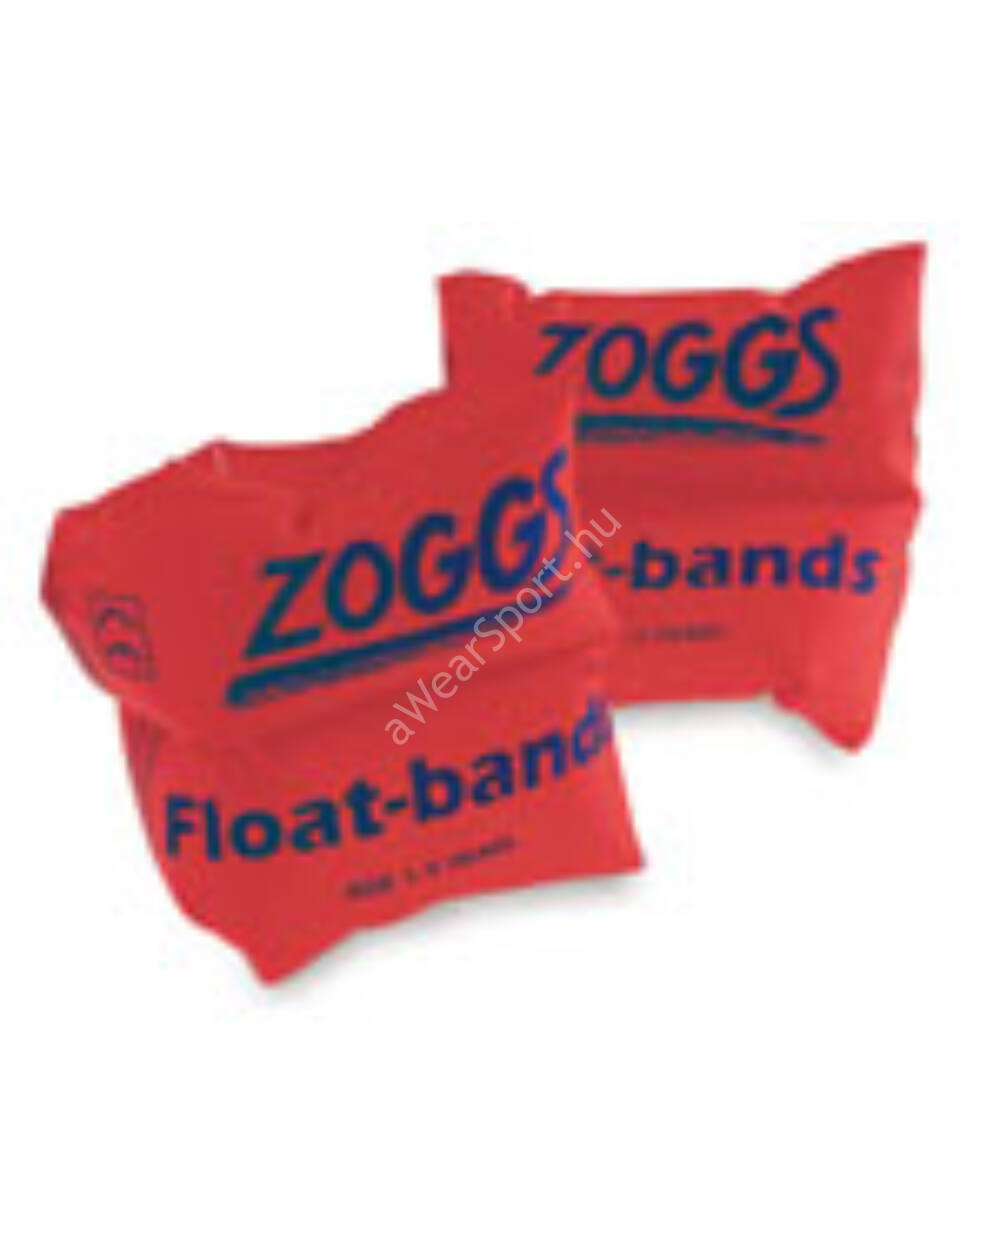 Zoggs karúszó 6-12 éves korig, max.50kg-ig